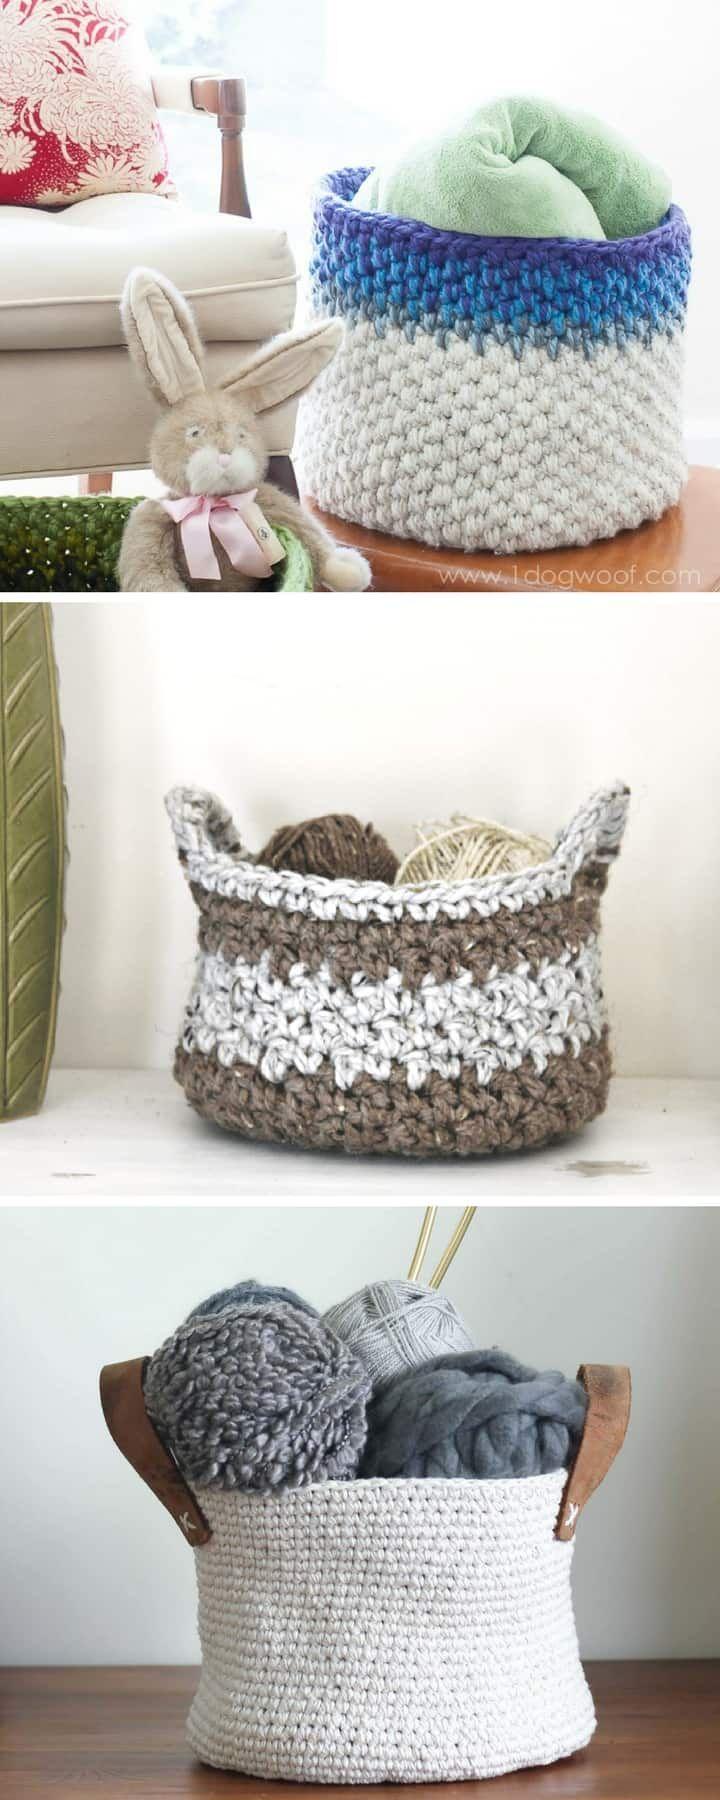 20 Free Crochet Basket Patterns to Make today!